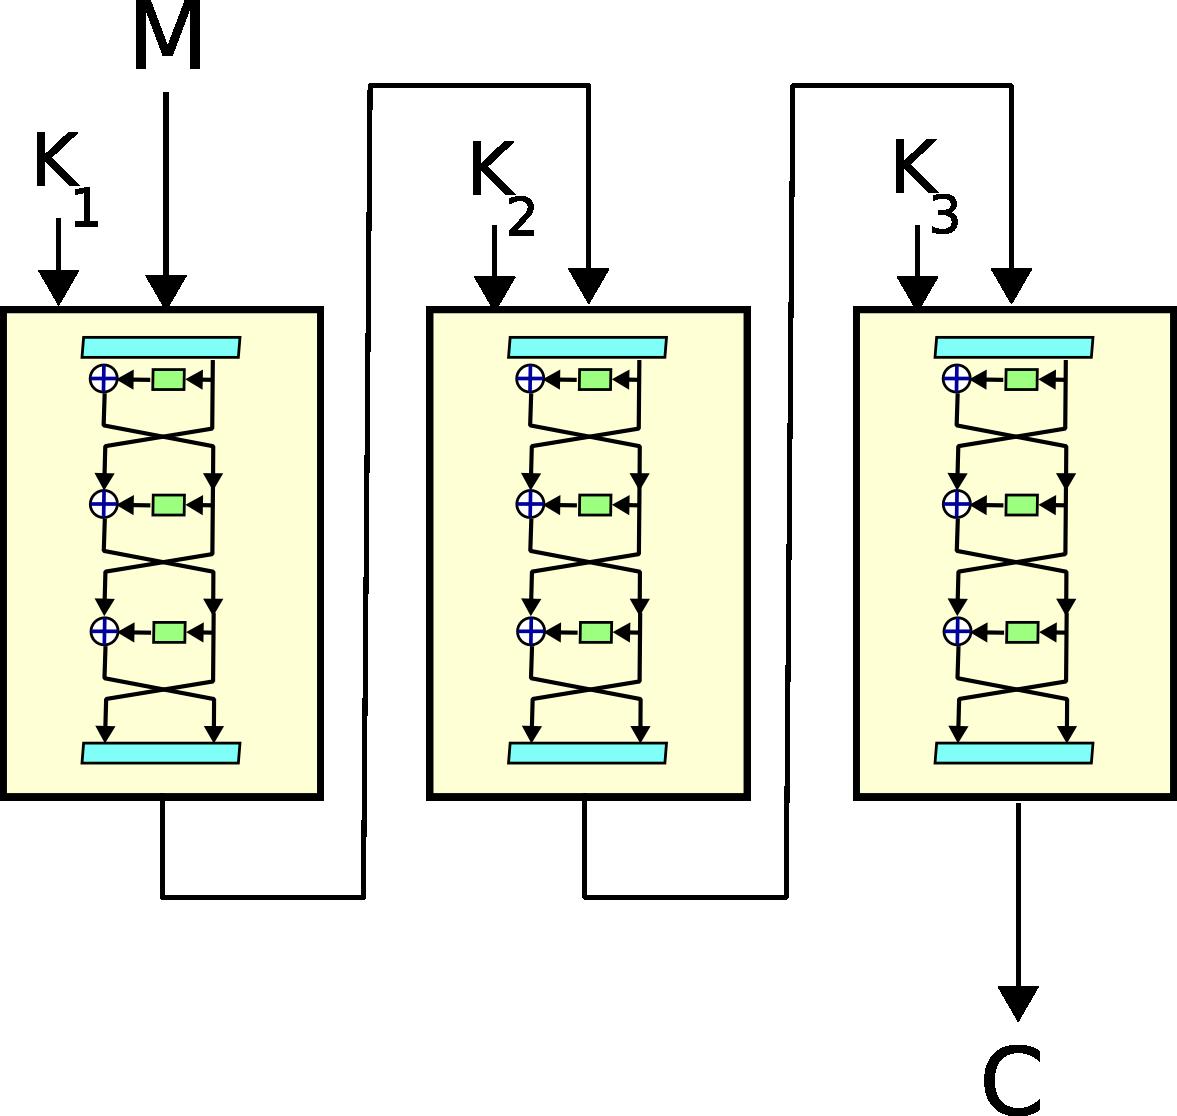 Des алгоритм шифрования схема